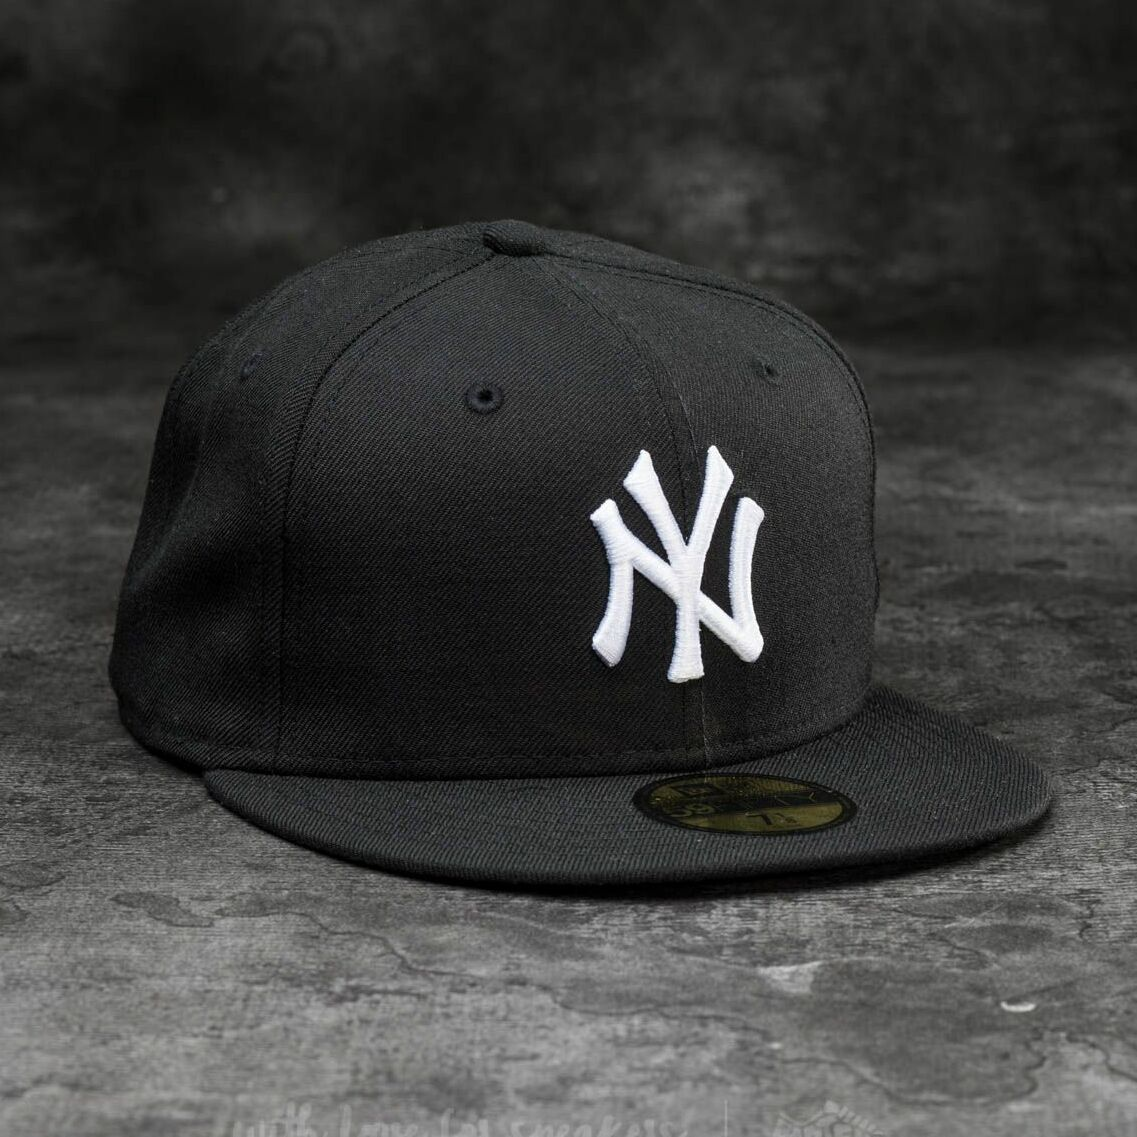 New Era 59Fifty MLB Basic New York Yankees Cap Black/ White 7 1/8